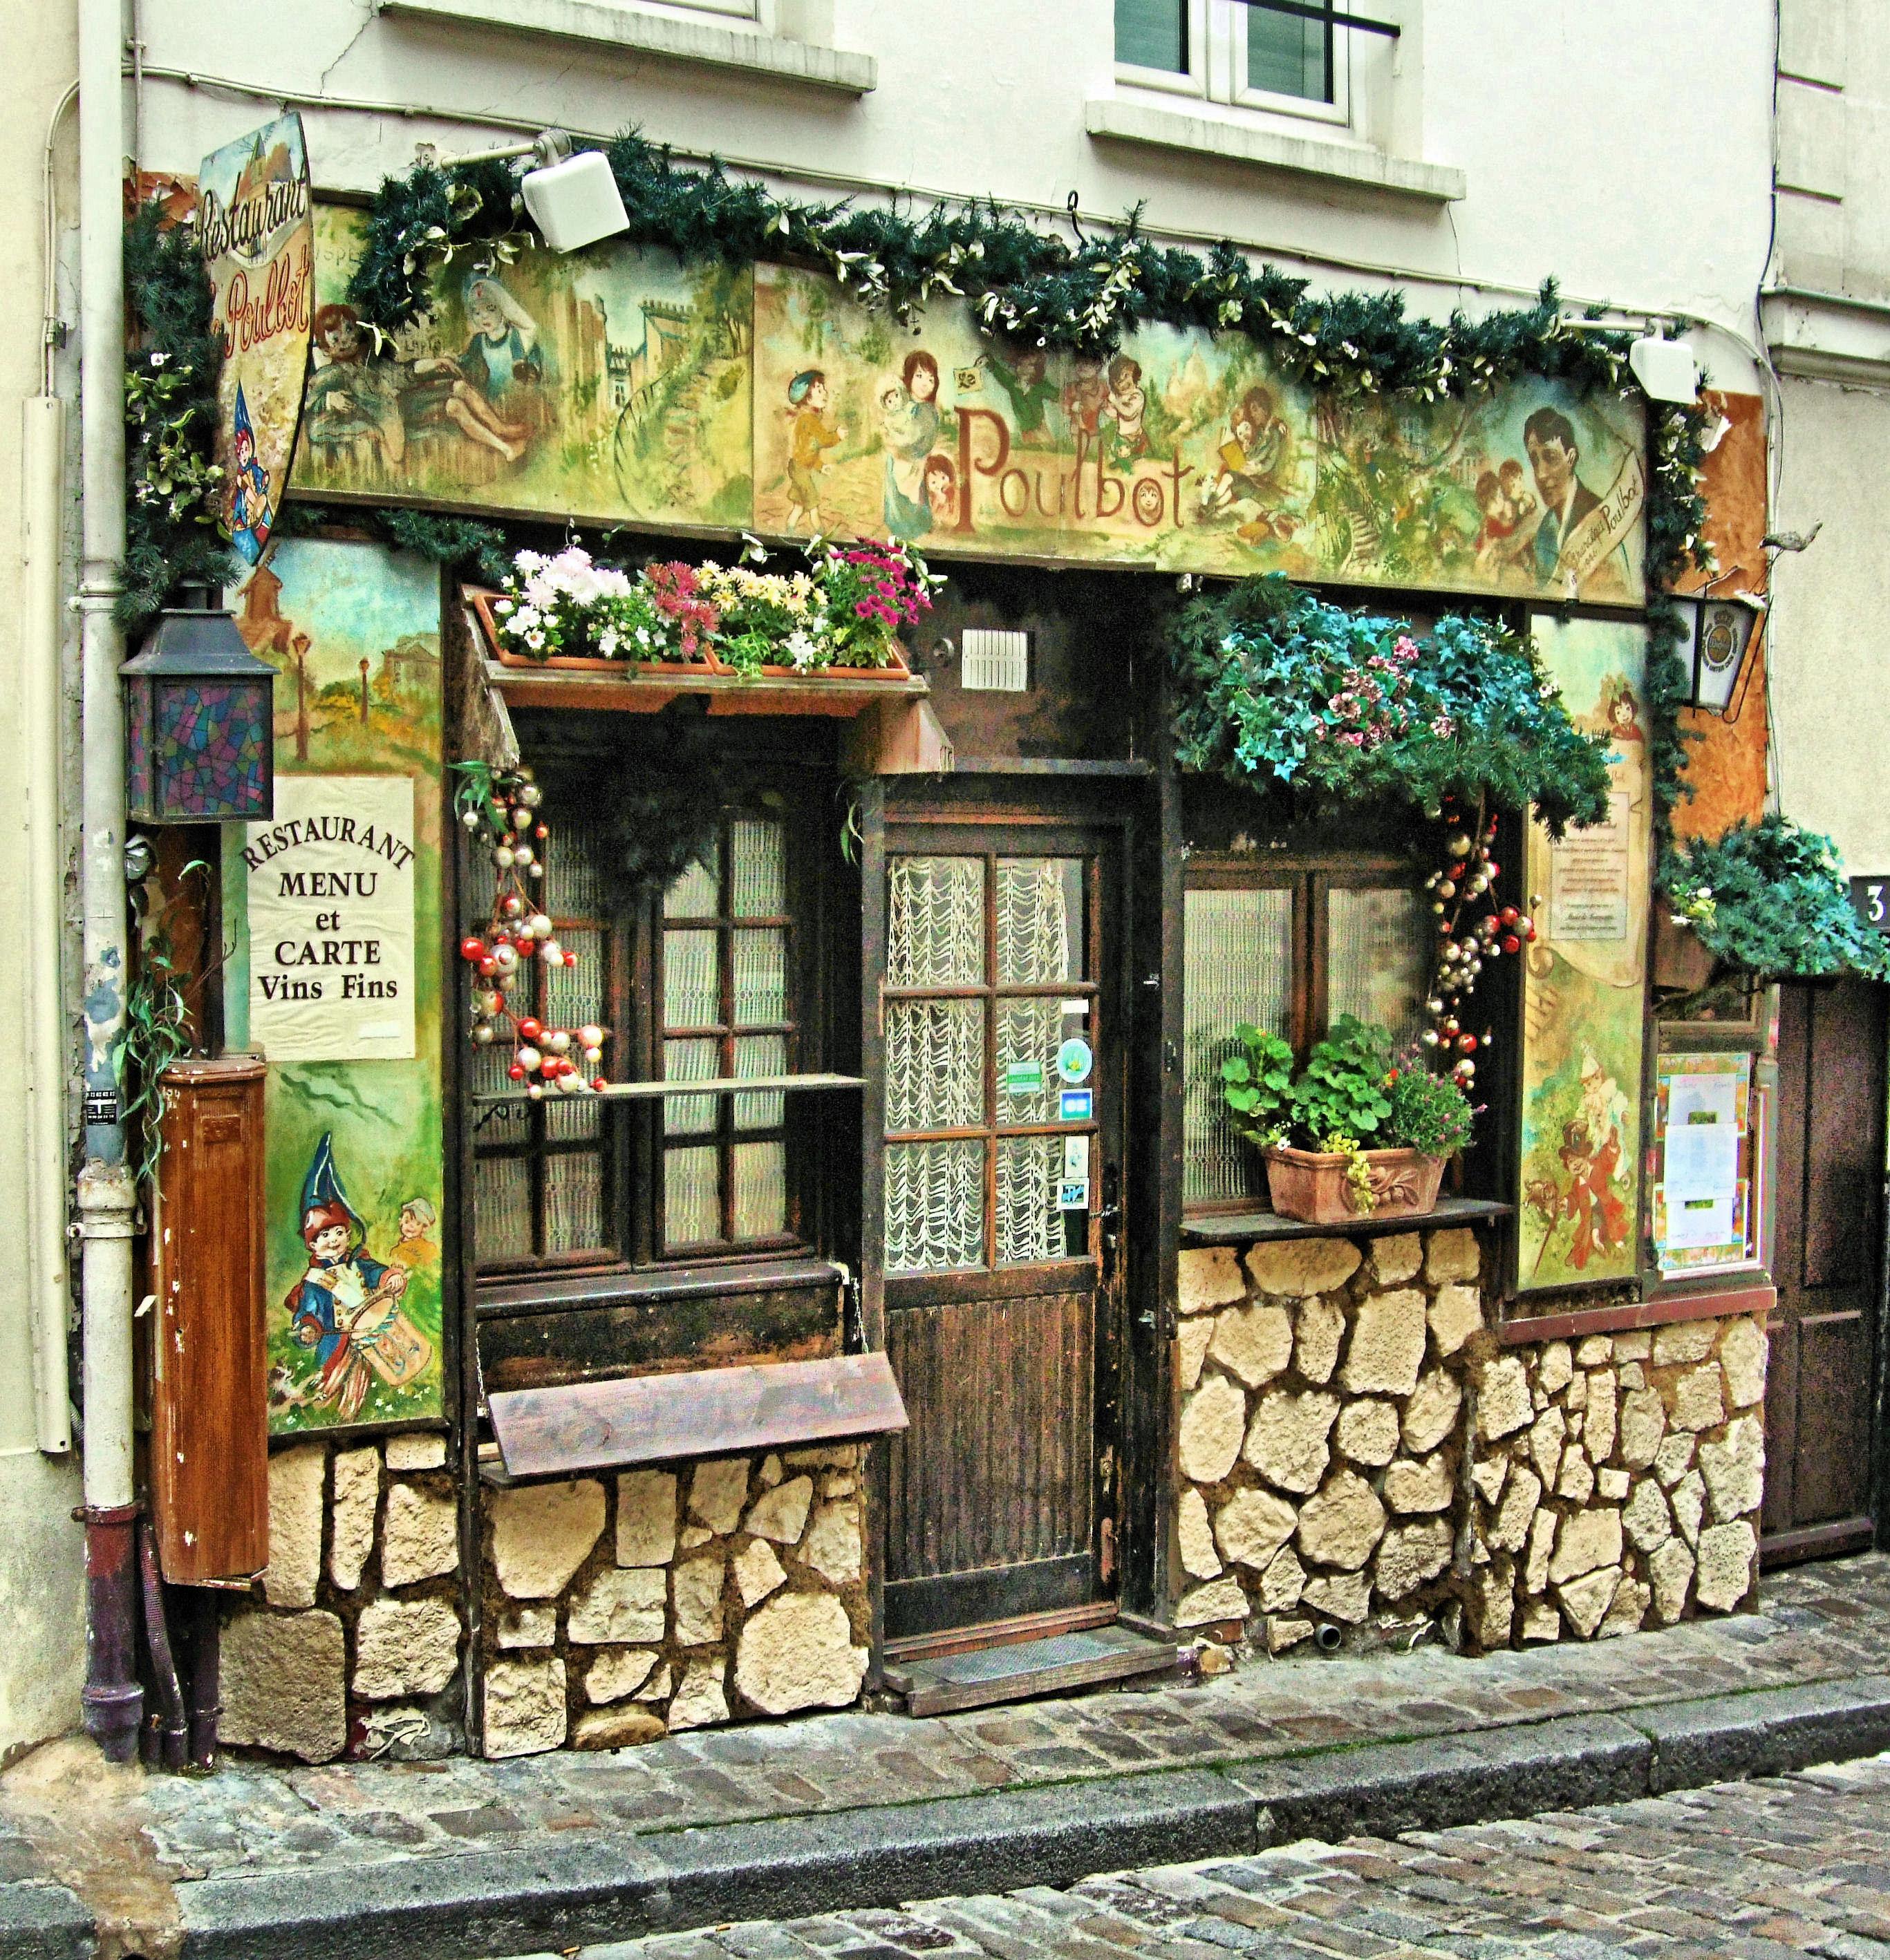 Cafe De Paris Fertigsauce